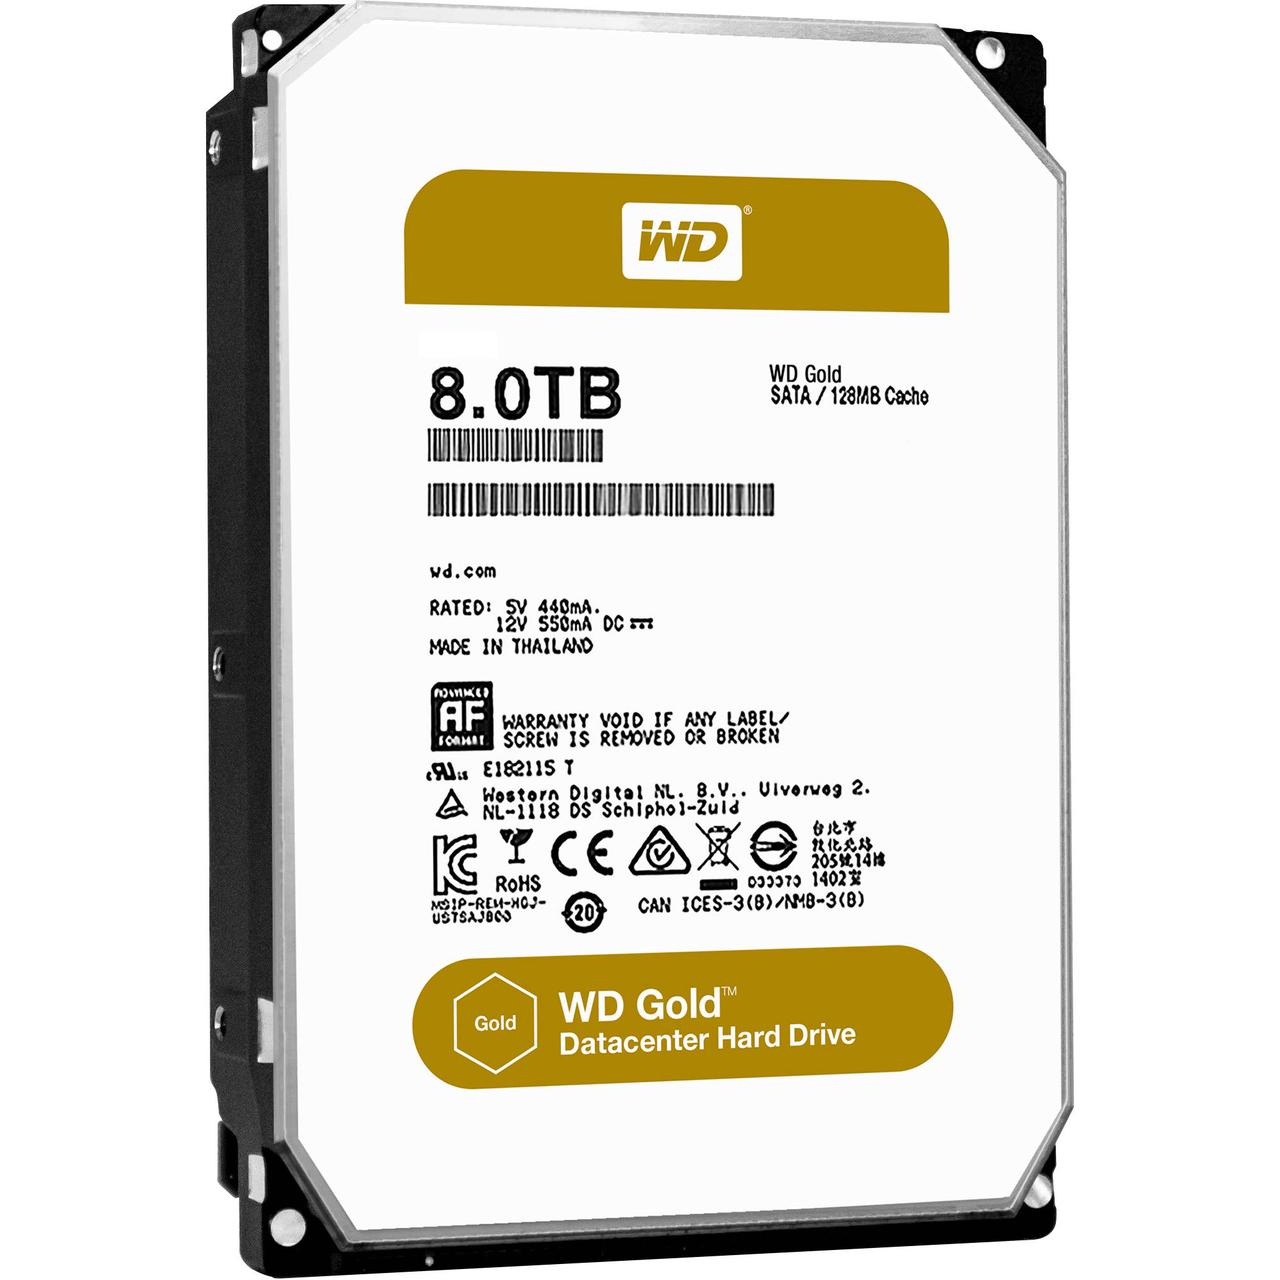 Жесткий диск внутренний Western Digital (WD) GOLD  7200RPM WD8002FRYZ (8Тб (8000Гб), HDD, 3,5″, Для серверов,